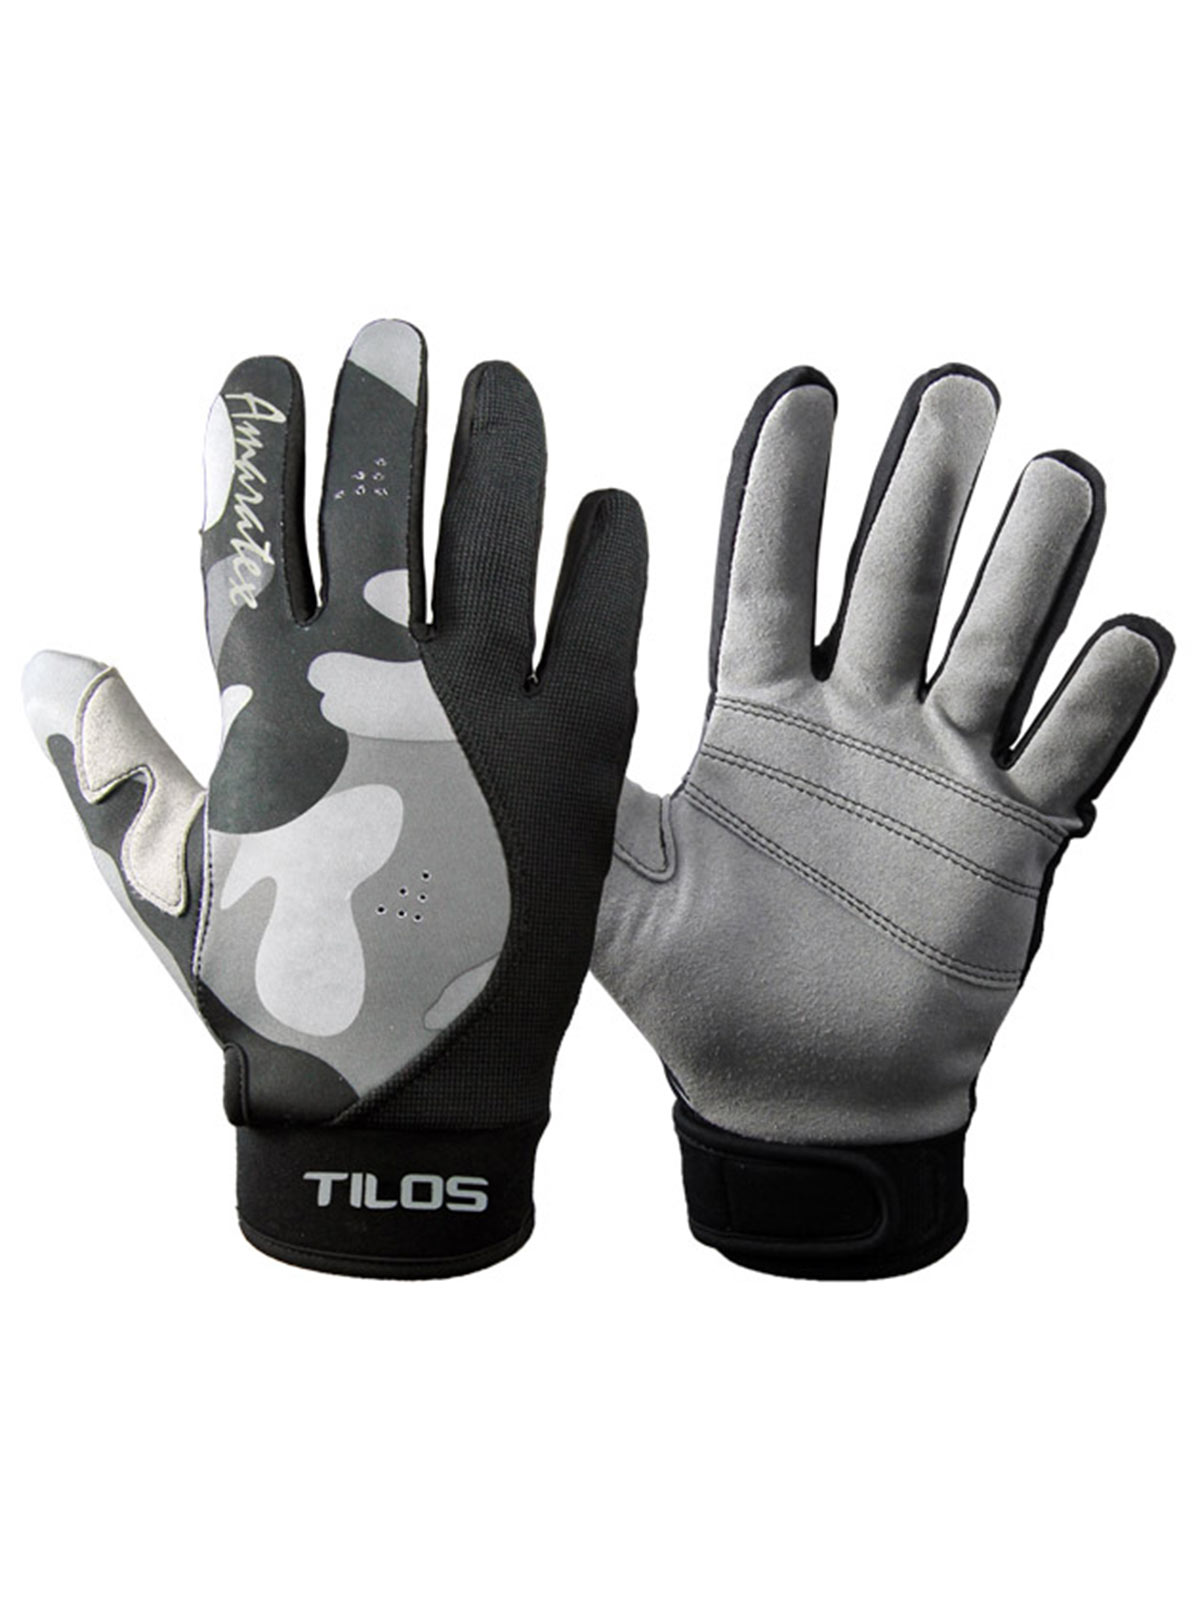 Tilos 1.5mm Neoprene Mesh Water Sports Gloves by Tilos